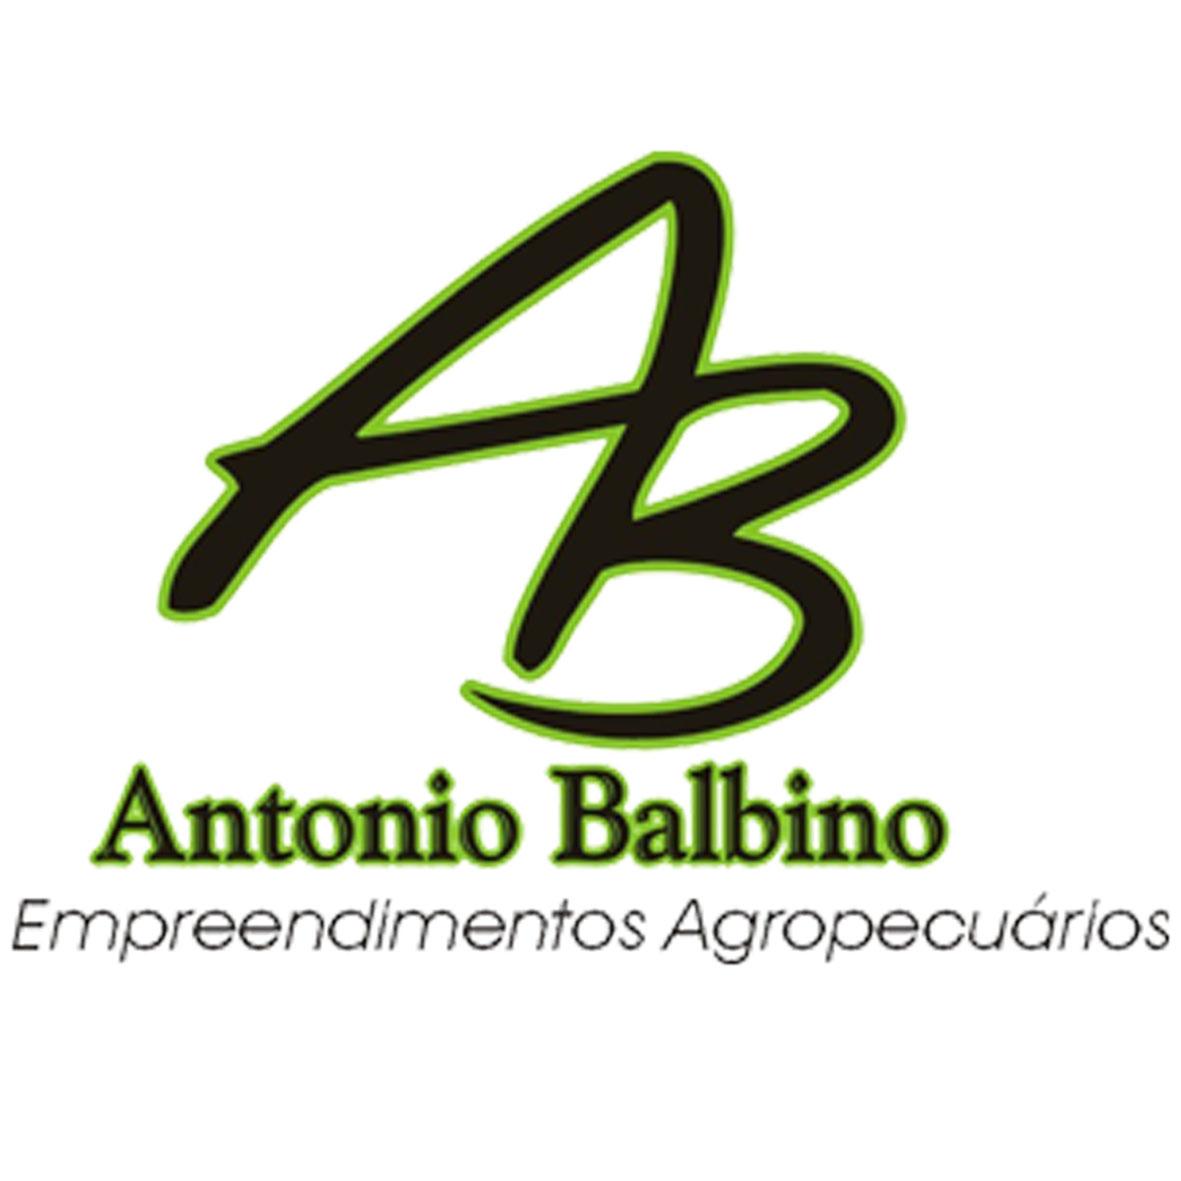 Antonio Balbino Empreendimentos Agropecuários